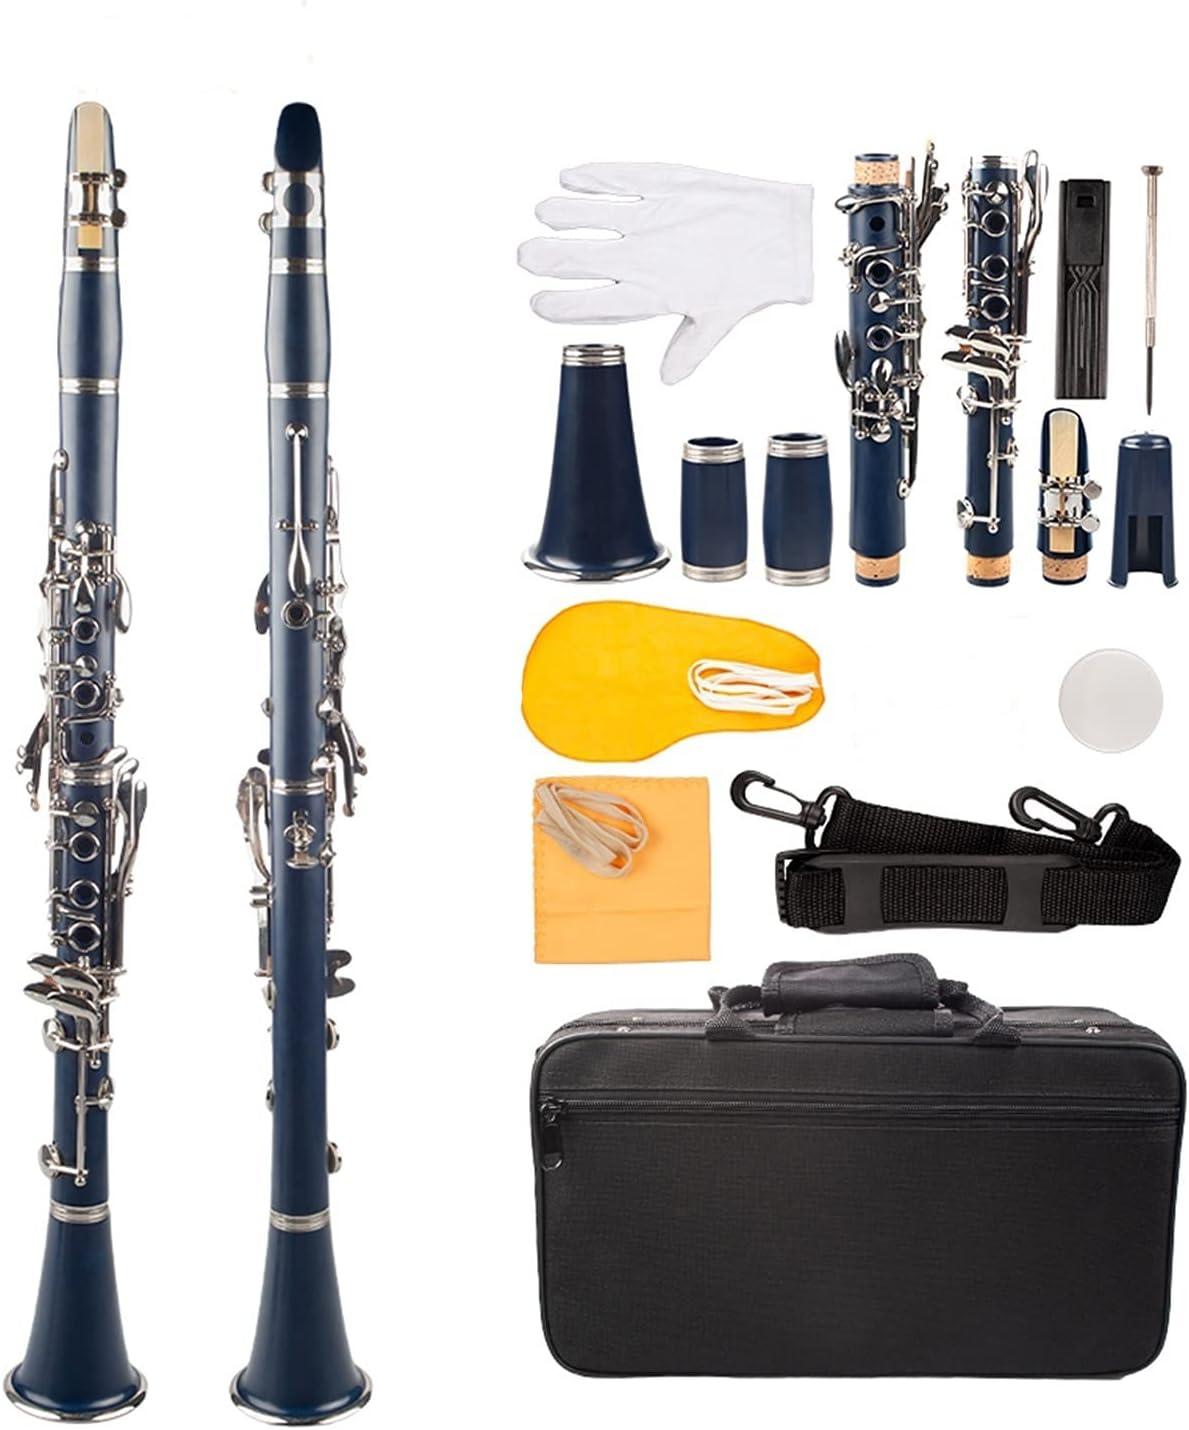 Clarinet Professional Japan Maker New Bb ABS Cupronickel Boston Mall Plate